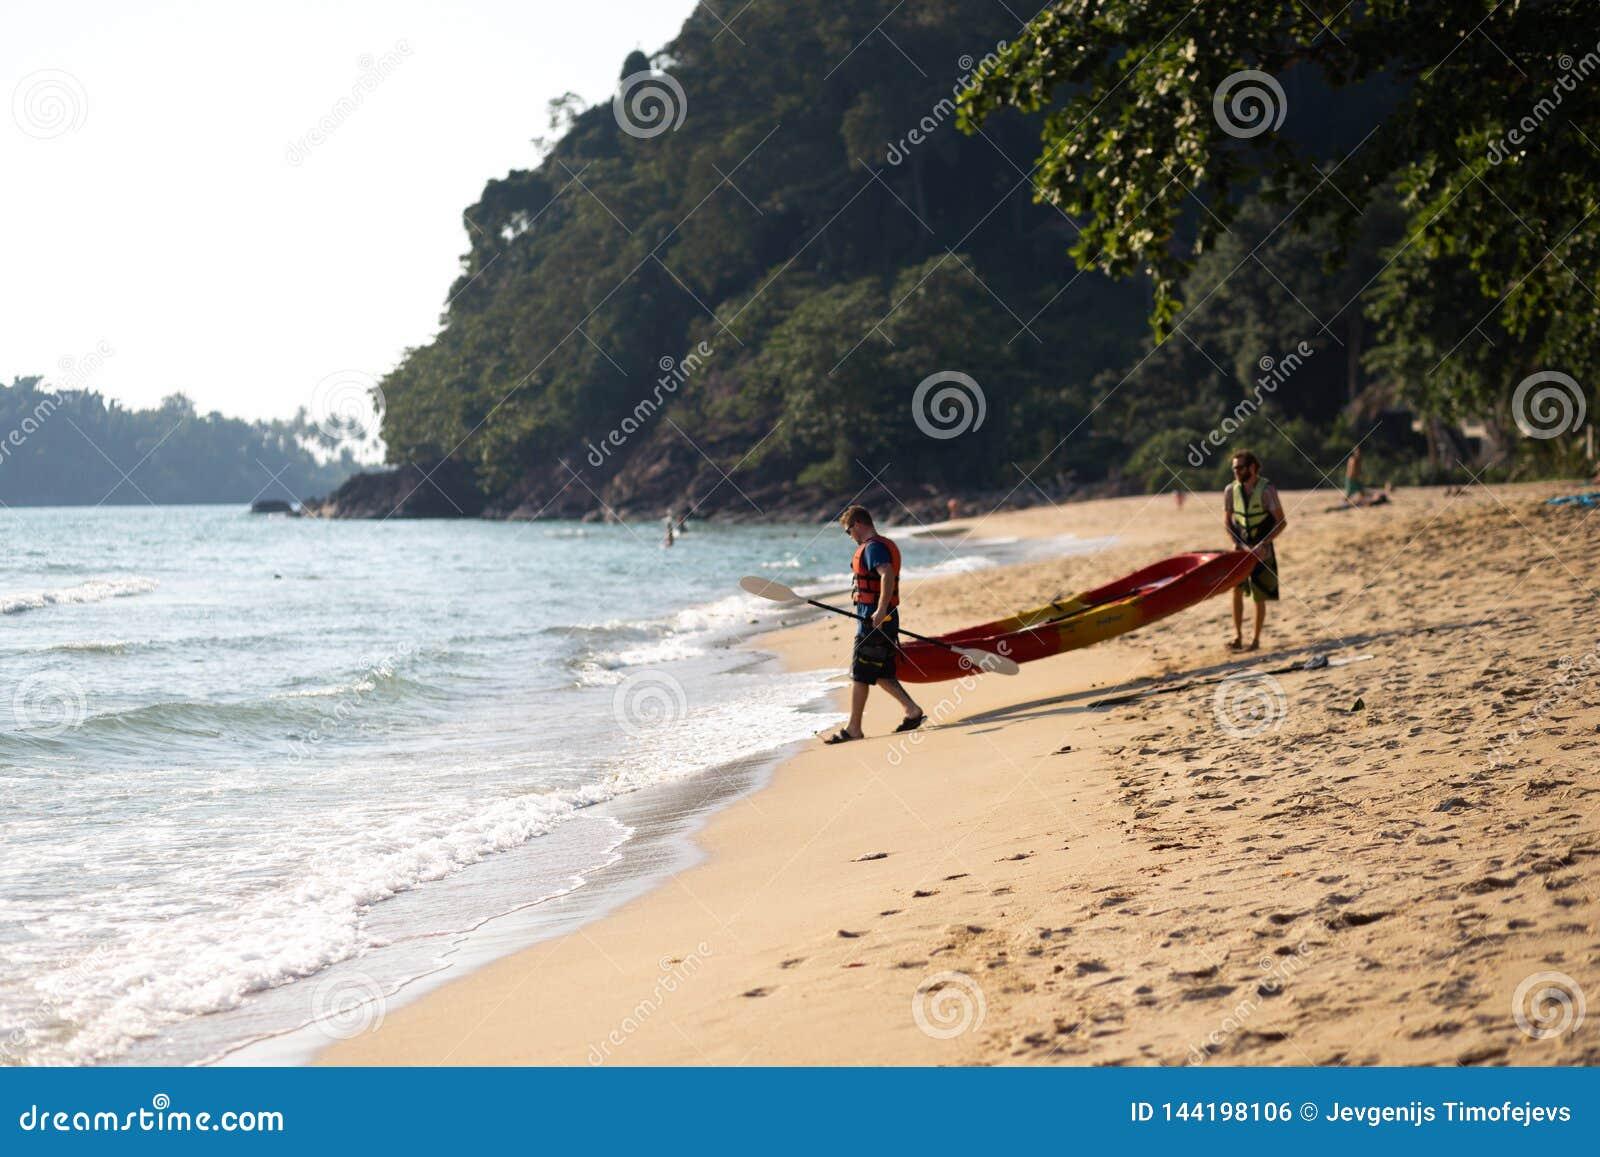 KO CHANG, THAILAND - APRIL 9, 2018: People men sweaming on a kayak boat - Beautiful tropical paradise beach